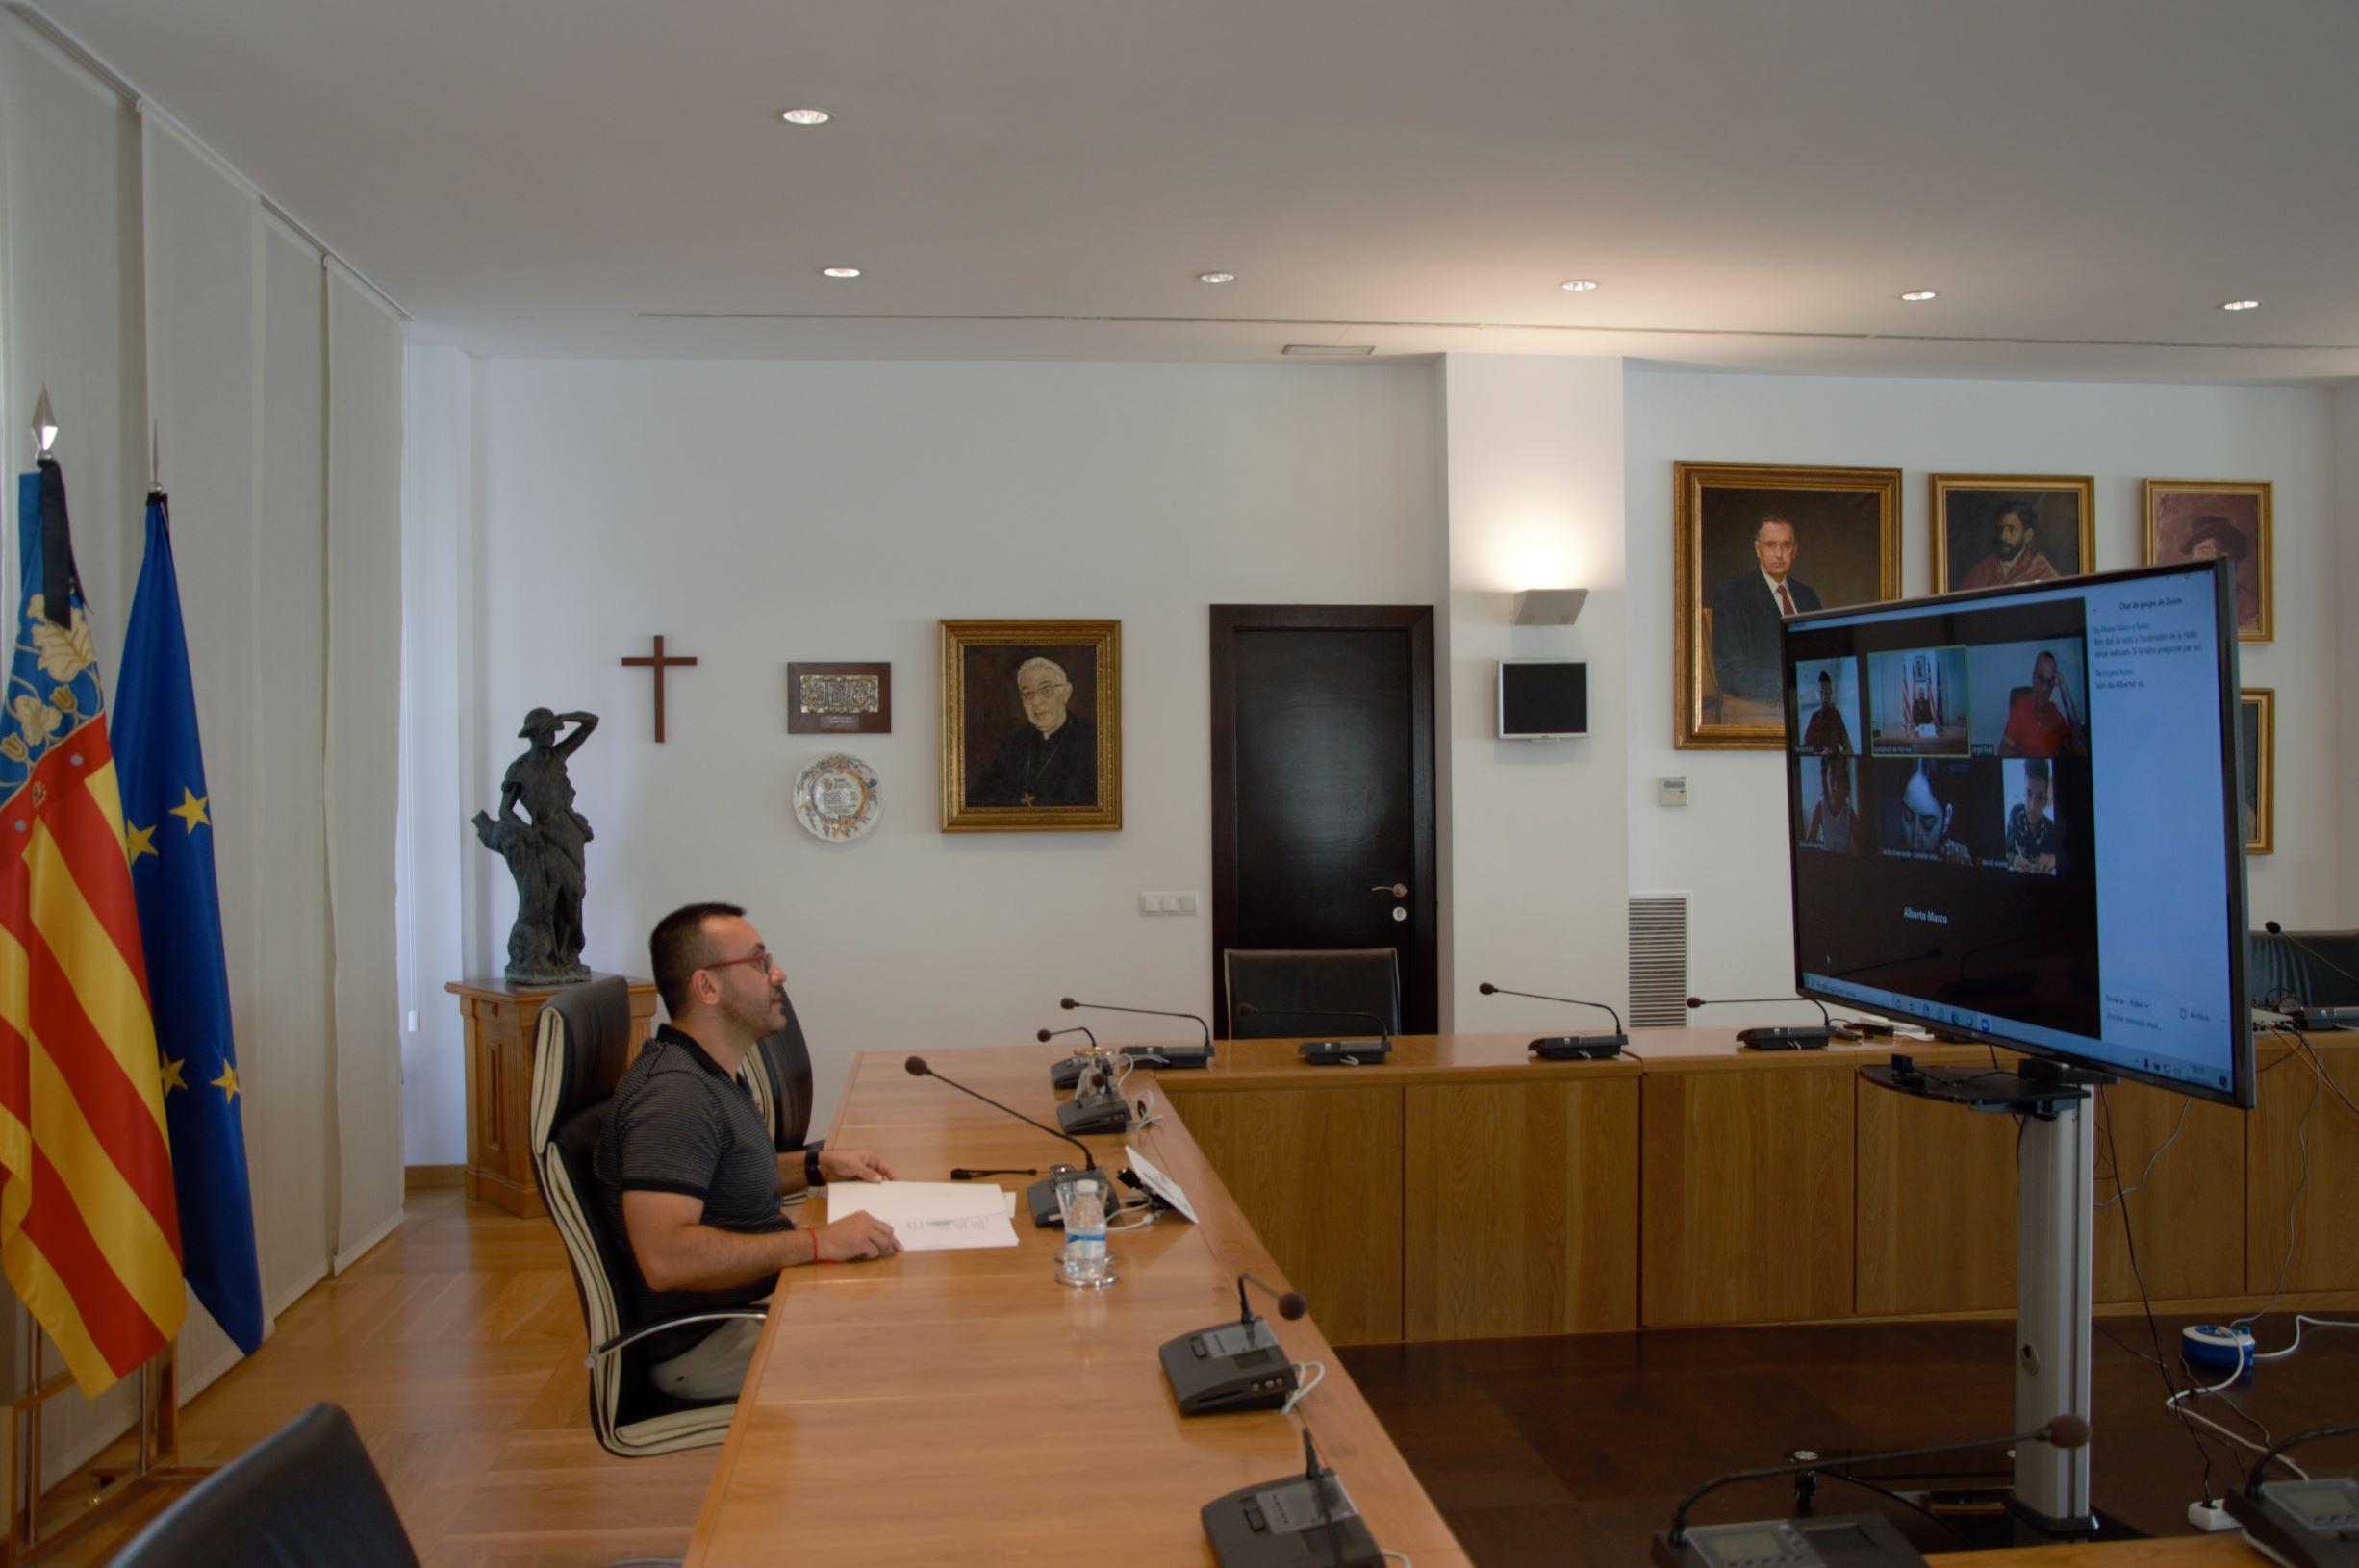 Escucha la rueda de prensa al completo del alcalde de Vila-real, José Benlloch (31-07-2020)